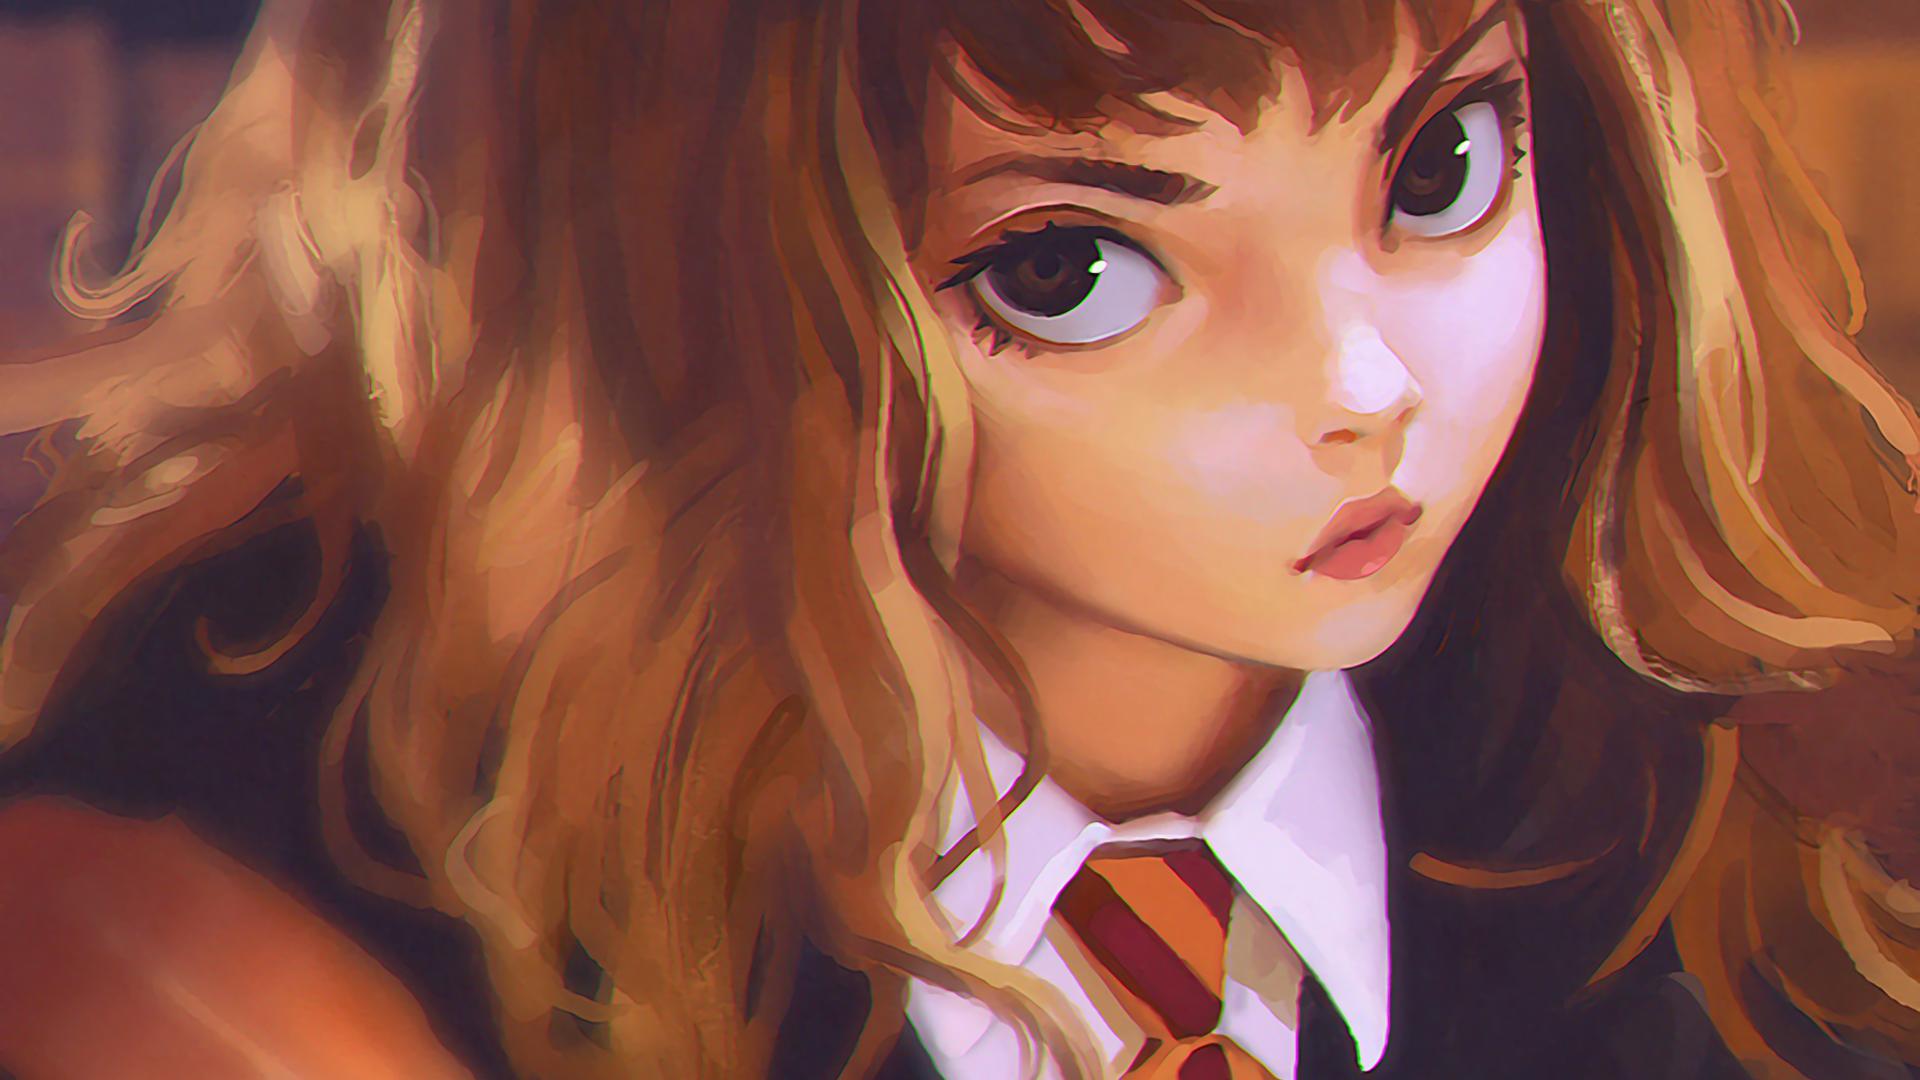 General 1920x1080 Ilya Kuvshinov drawing Harry Potter Hermione Granger